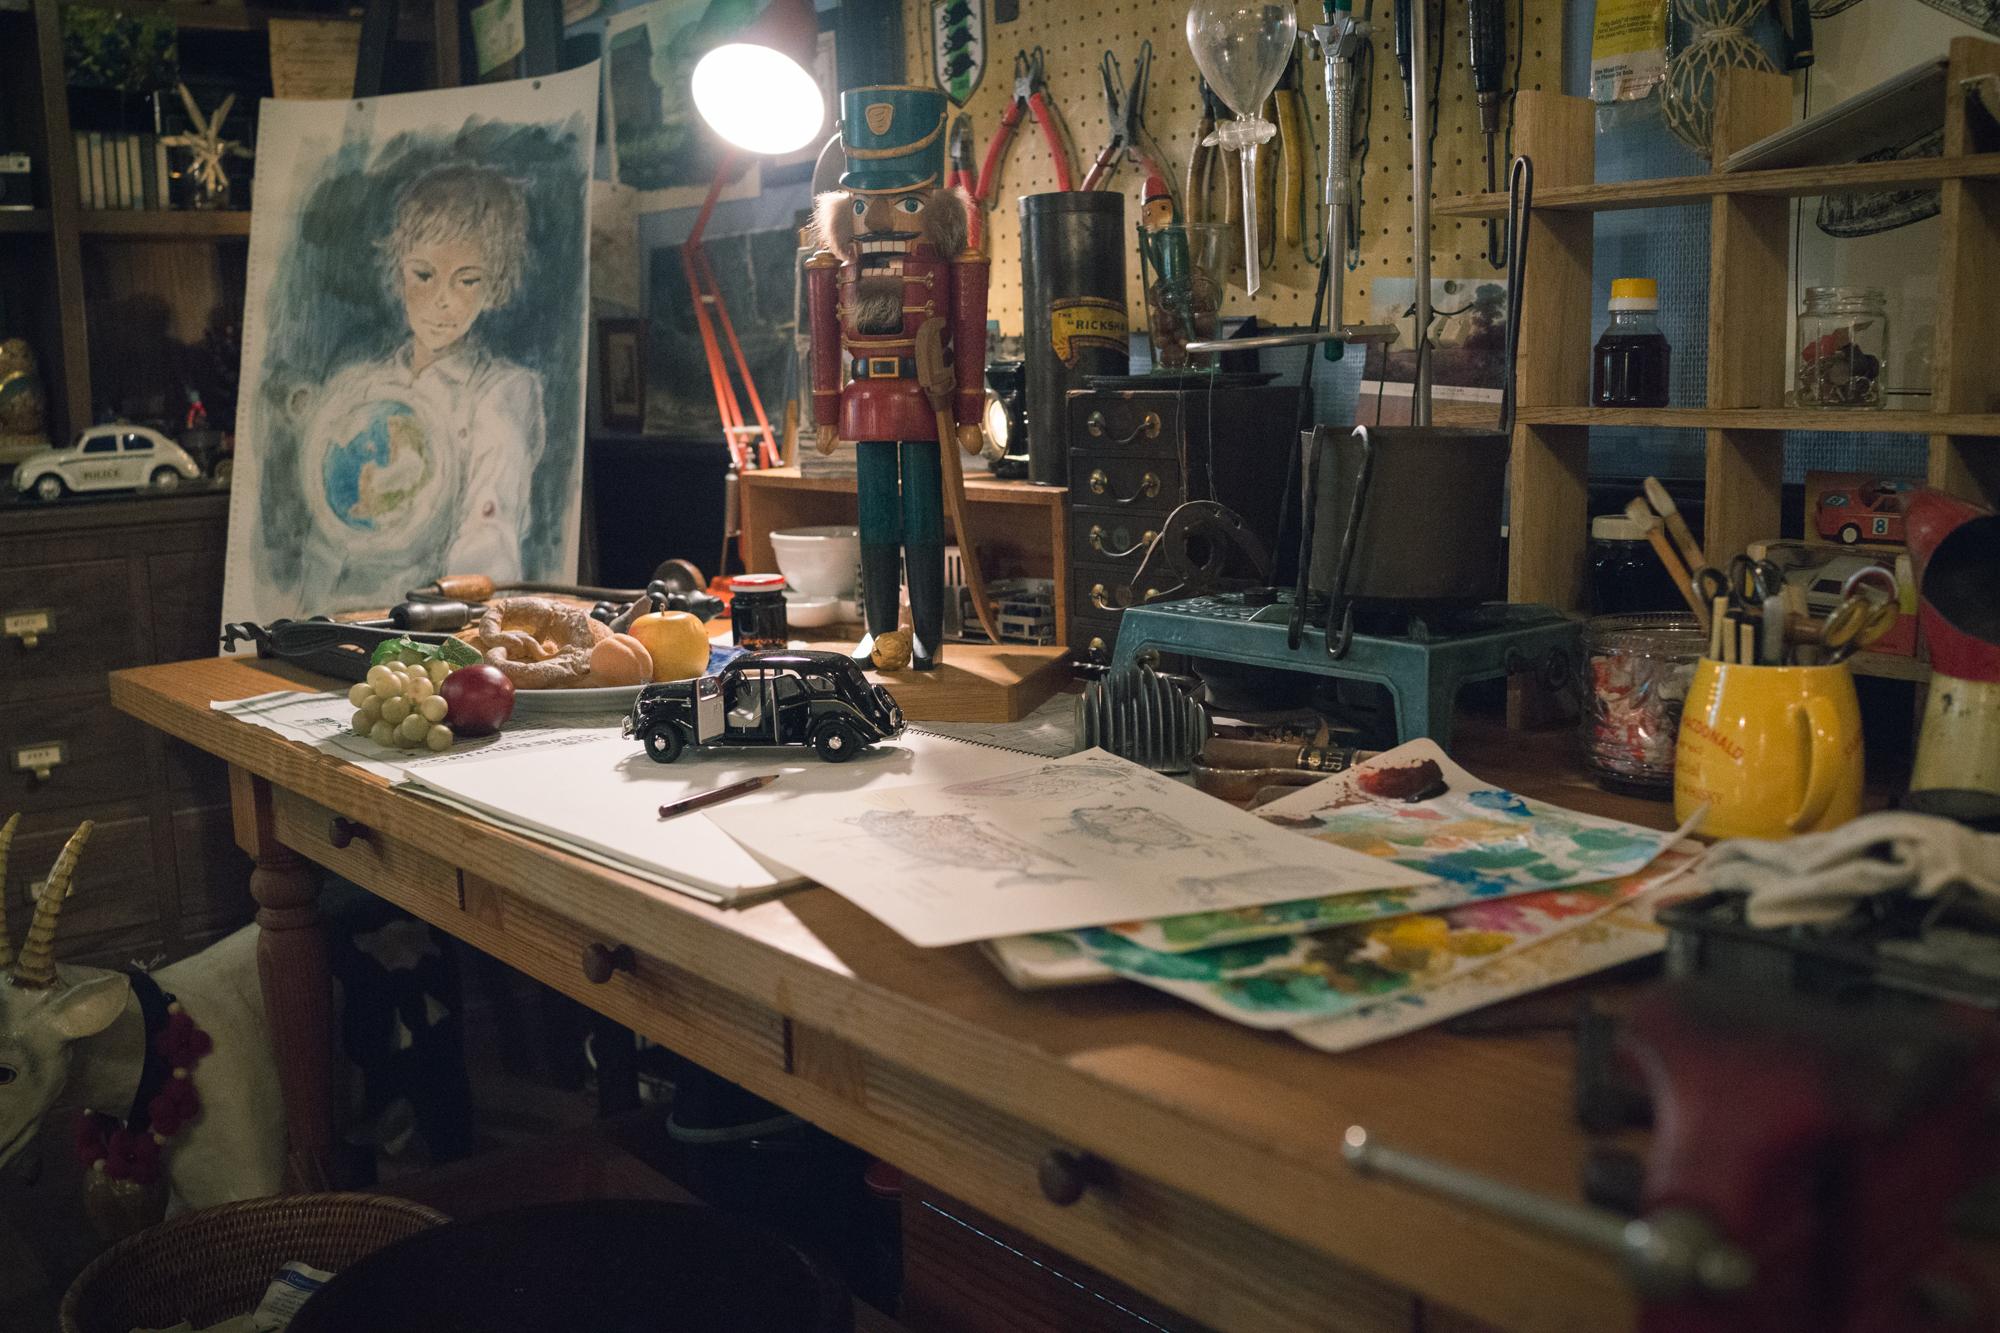 Hayao Miyazaki's Desk at Ghibli Museum